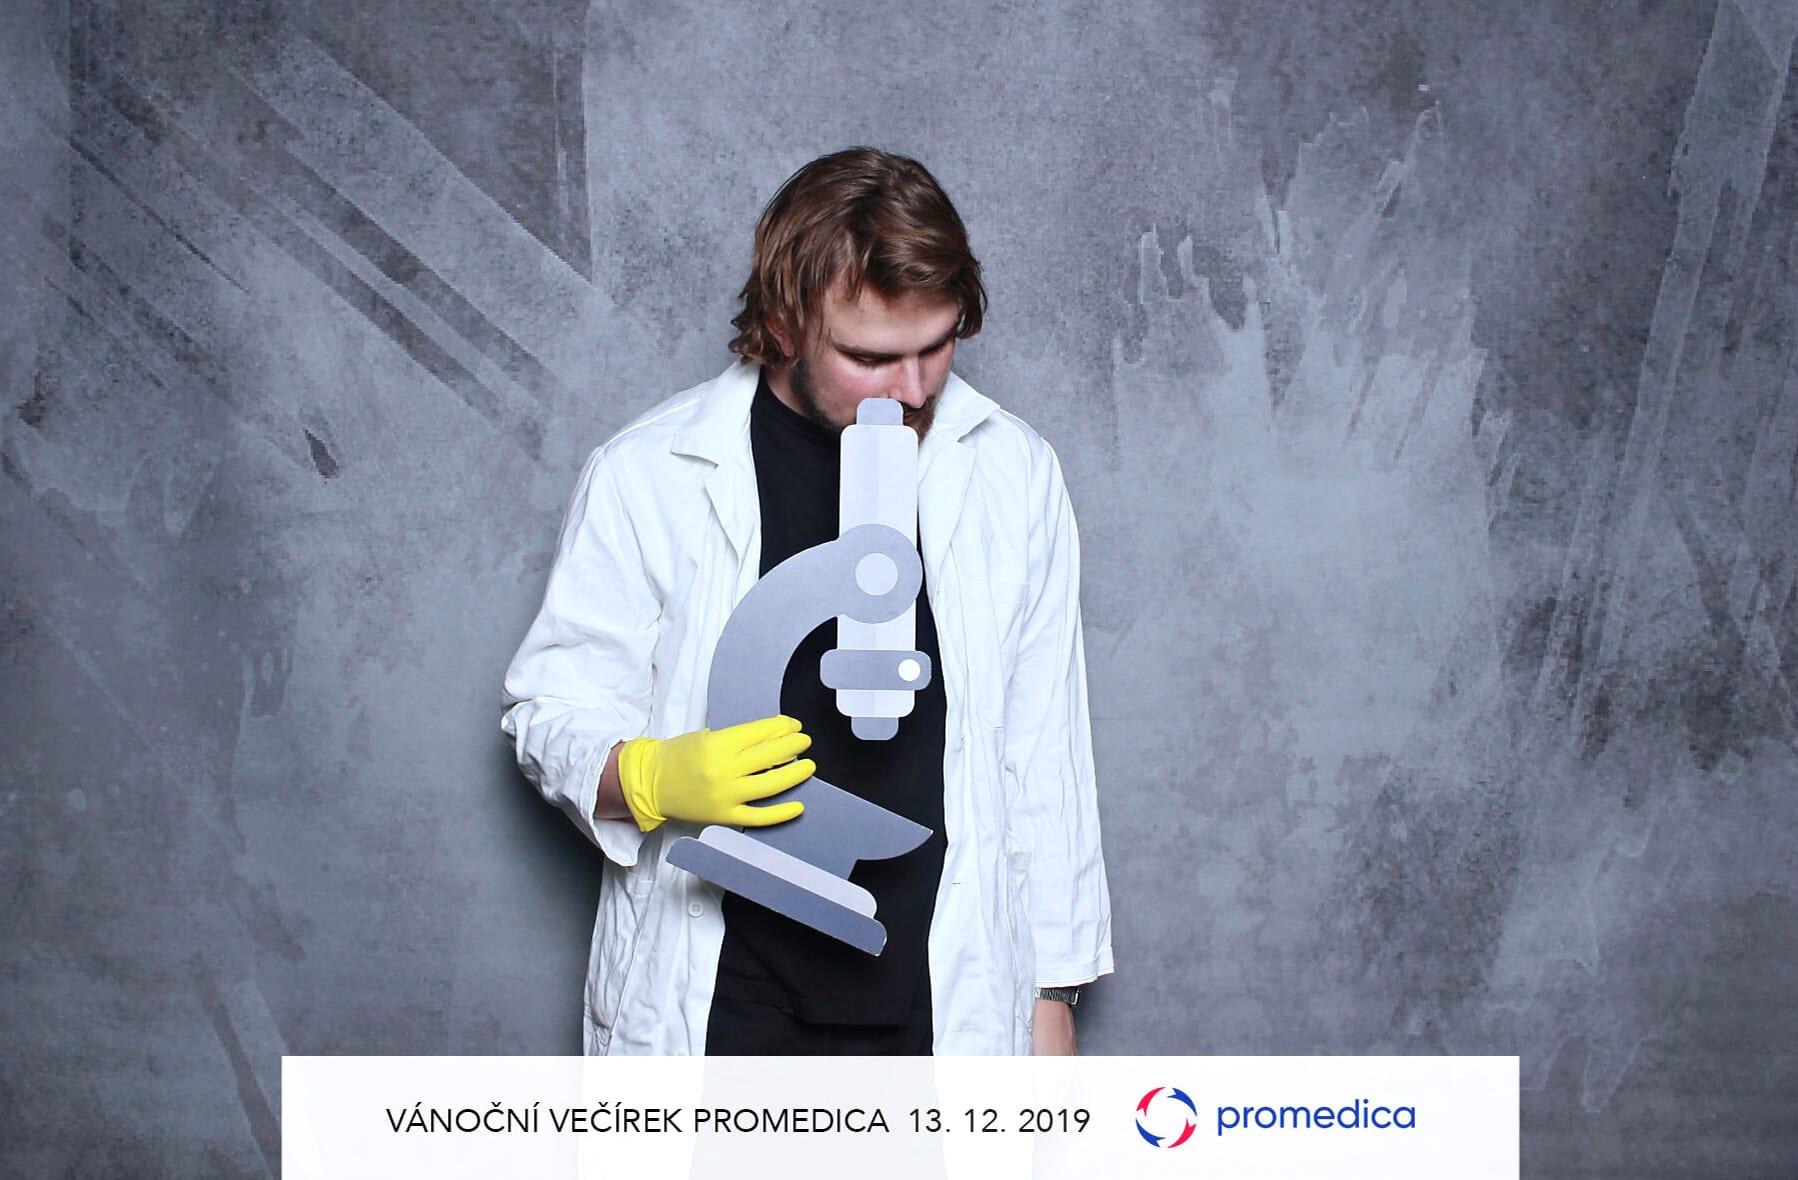 fotokoutek-firemni-vecirek-praha-vanocni-vecirek-promedica-13-12-2019-694390